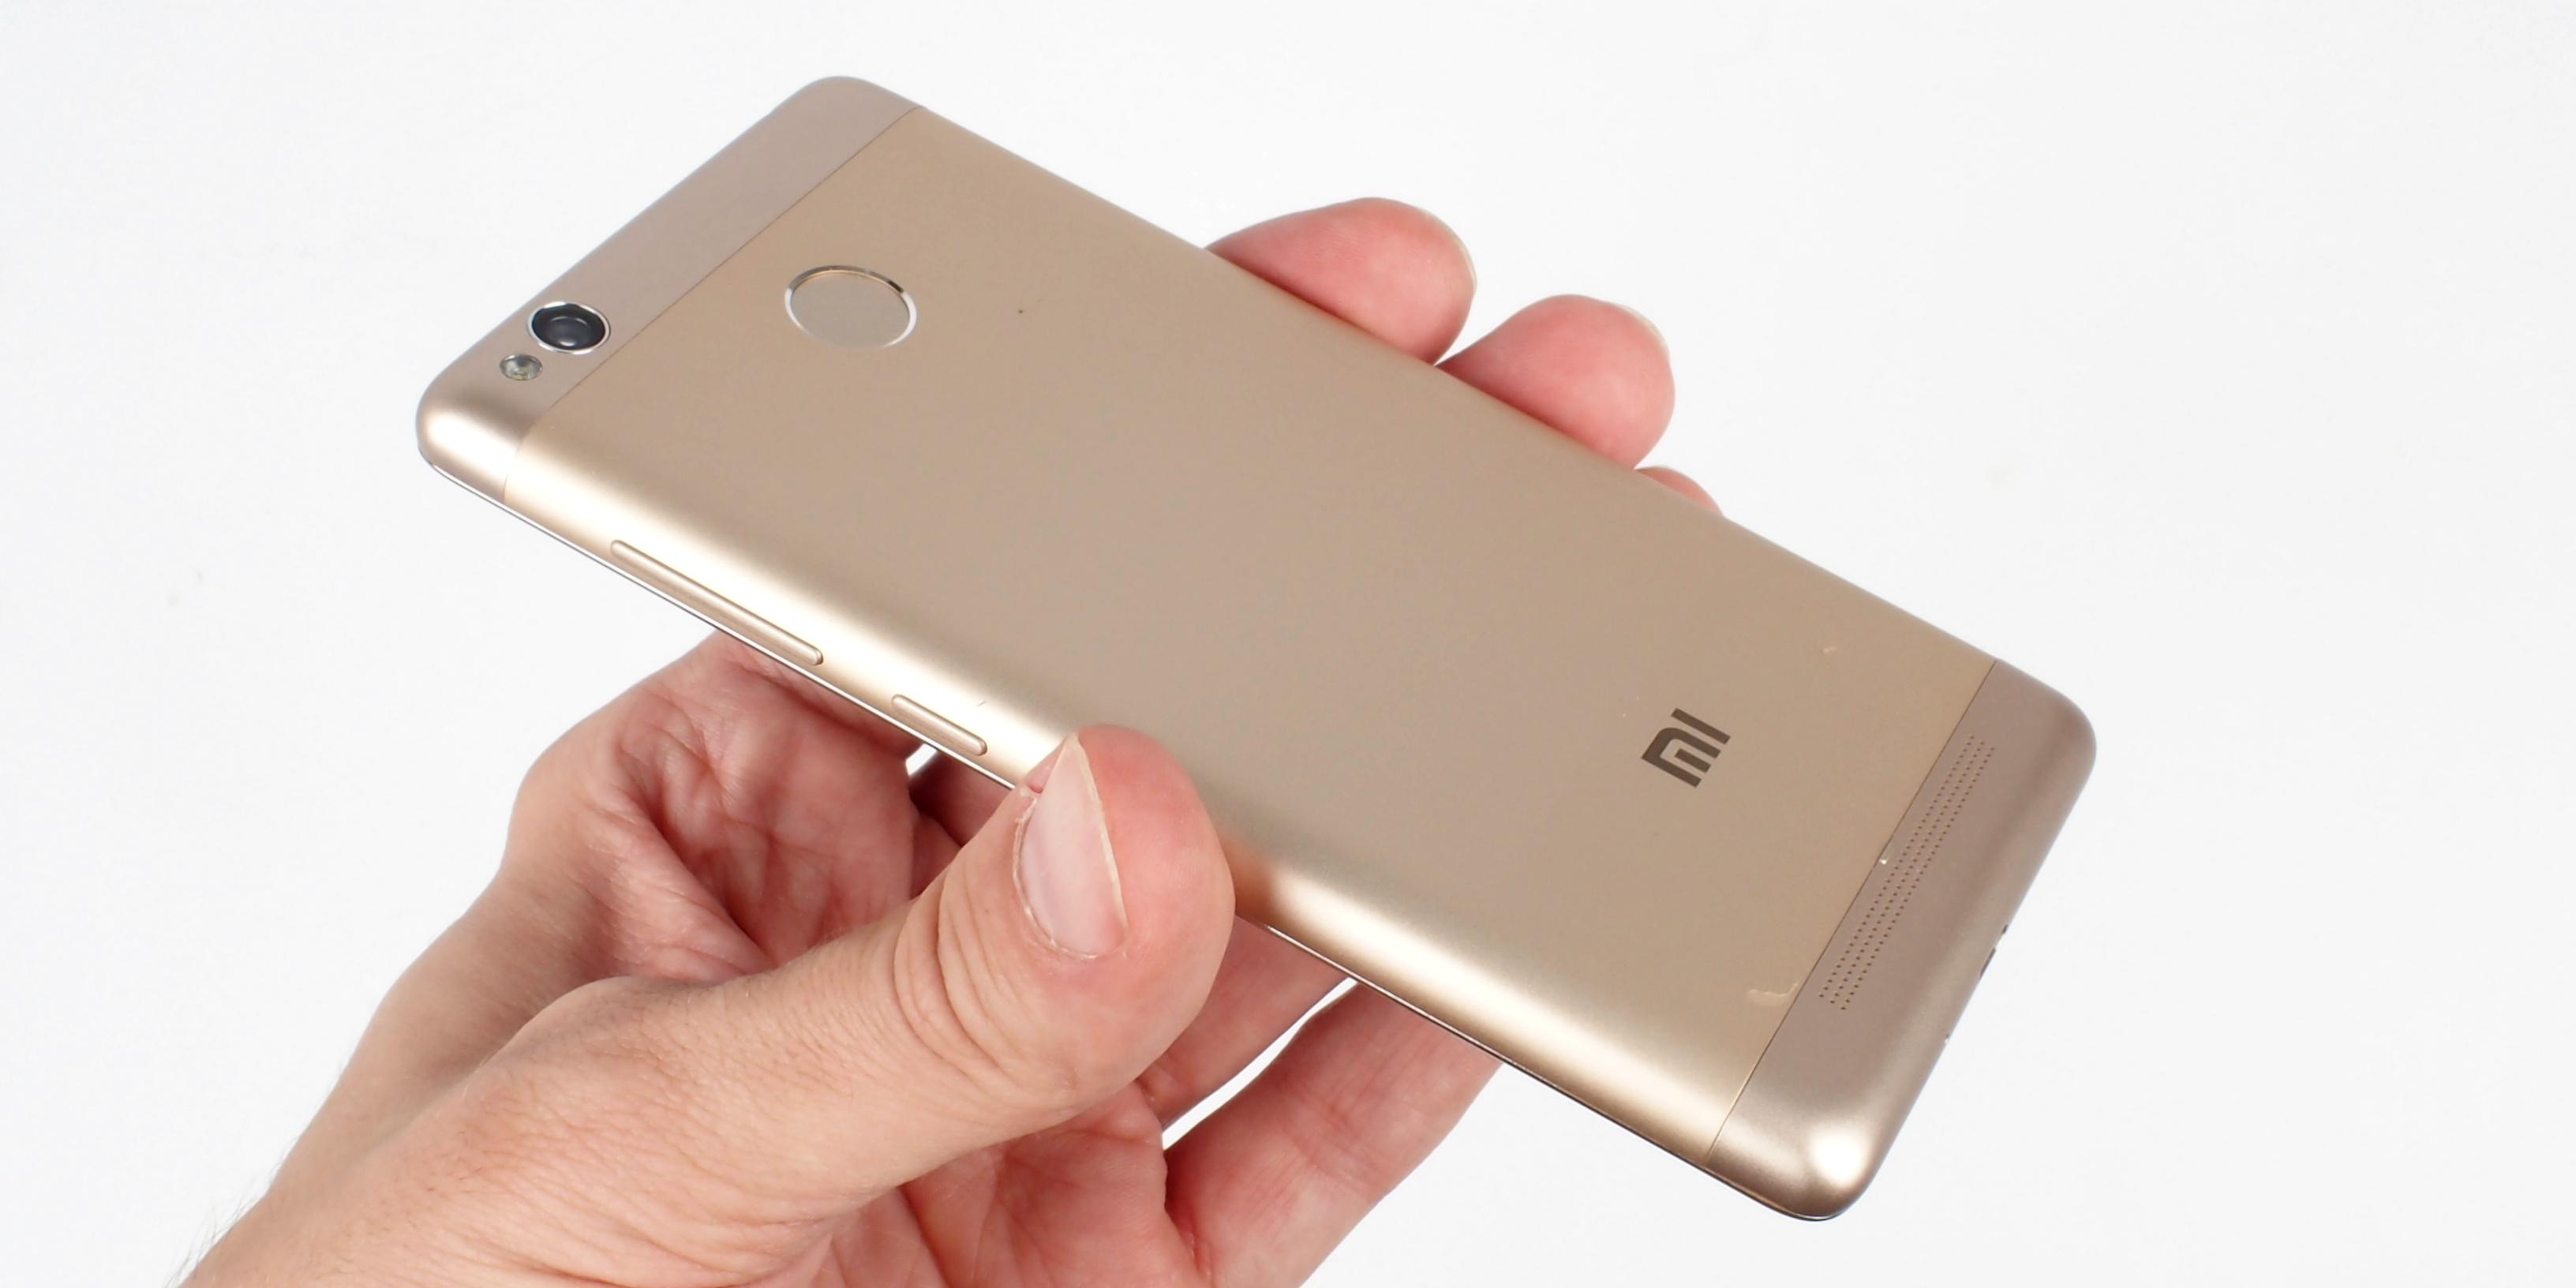 Xiaomi Redmi 3s osvědčen½ recept [recenze] 2 kapitola – MobilMania